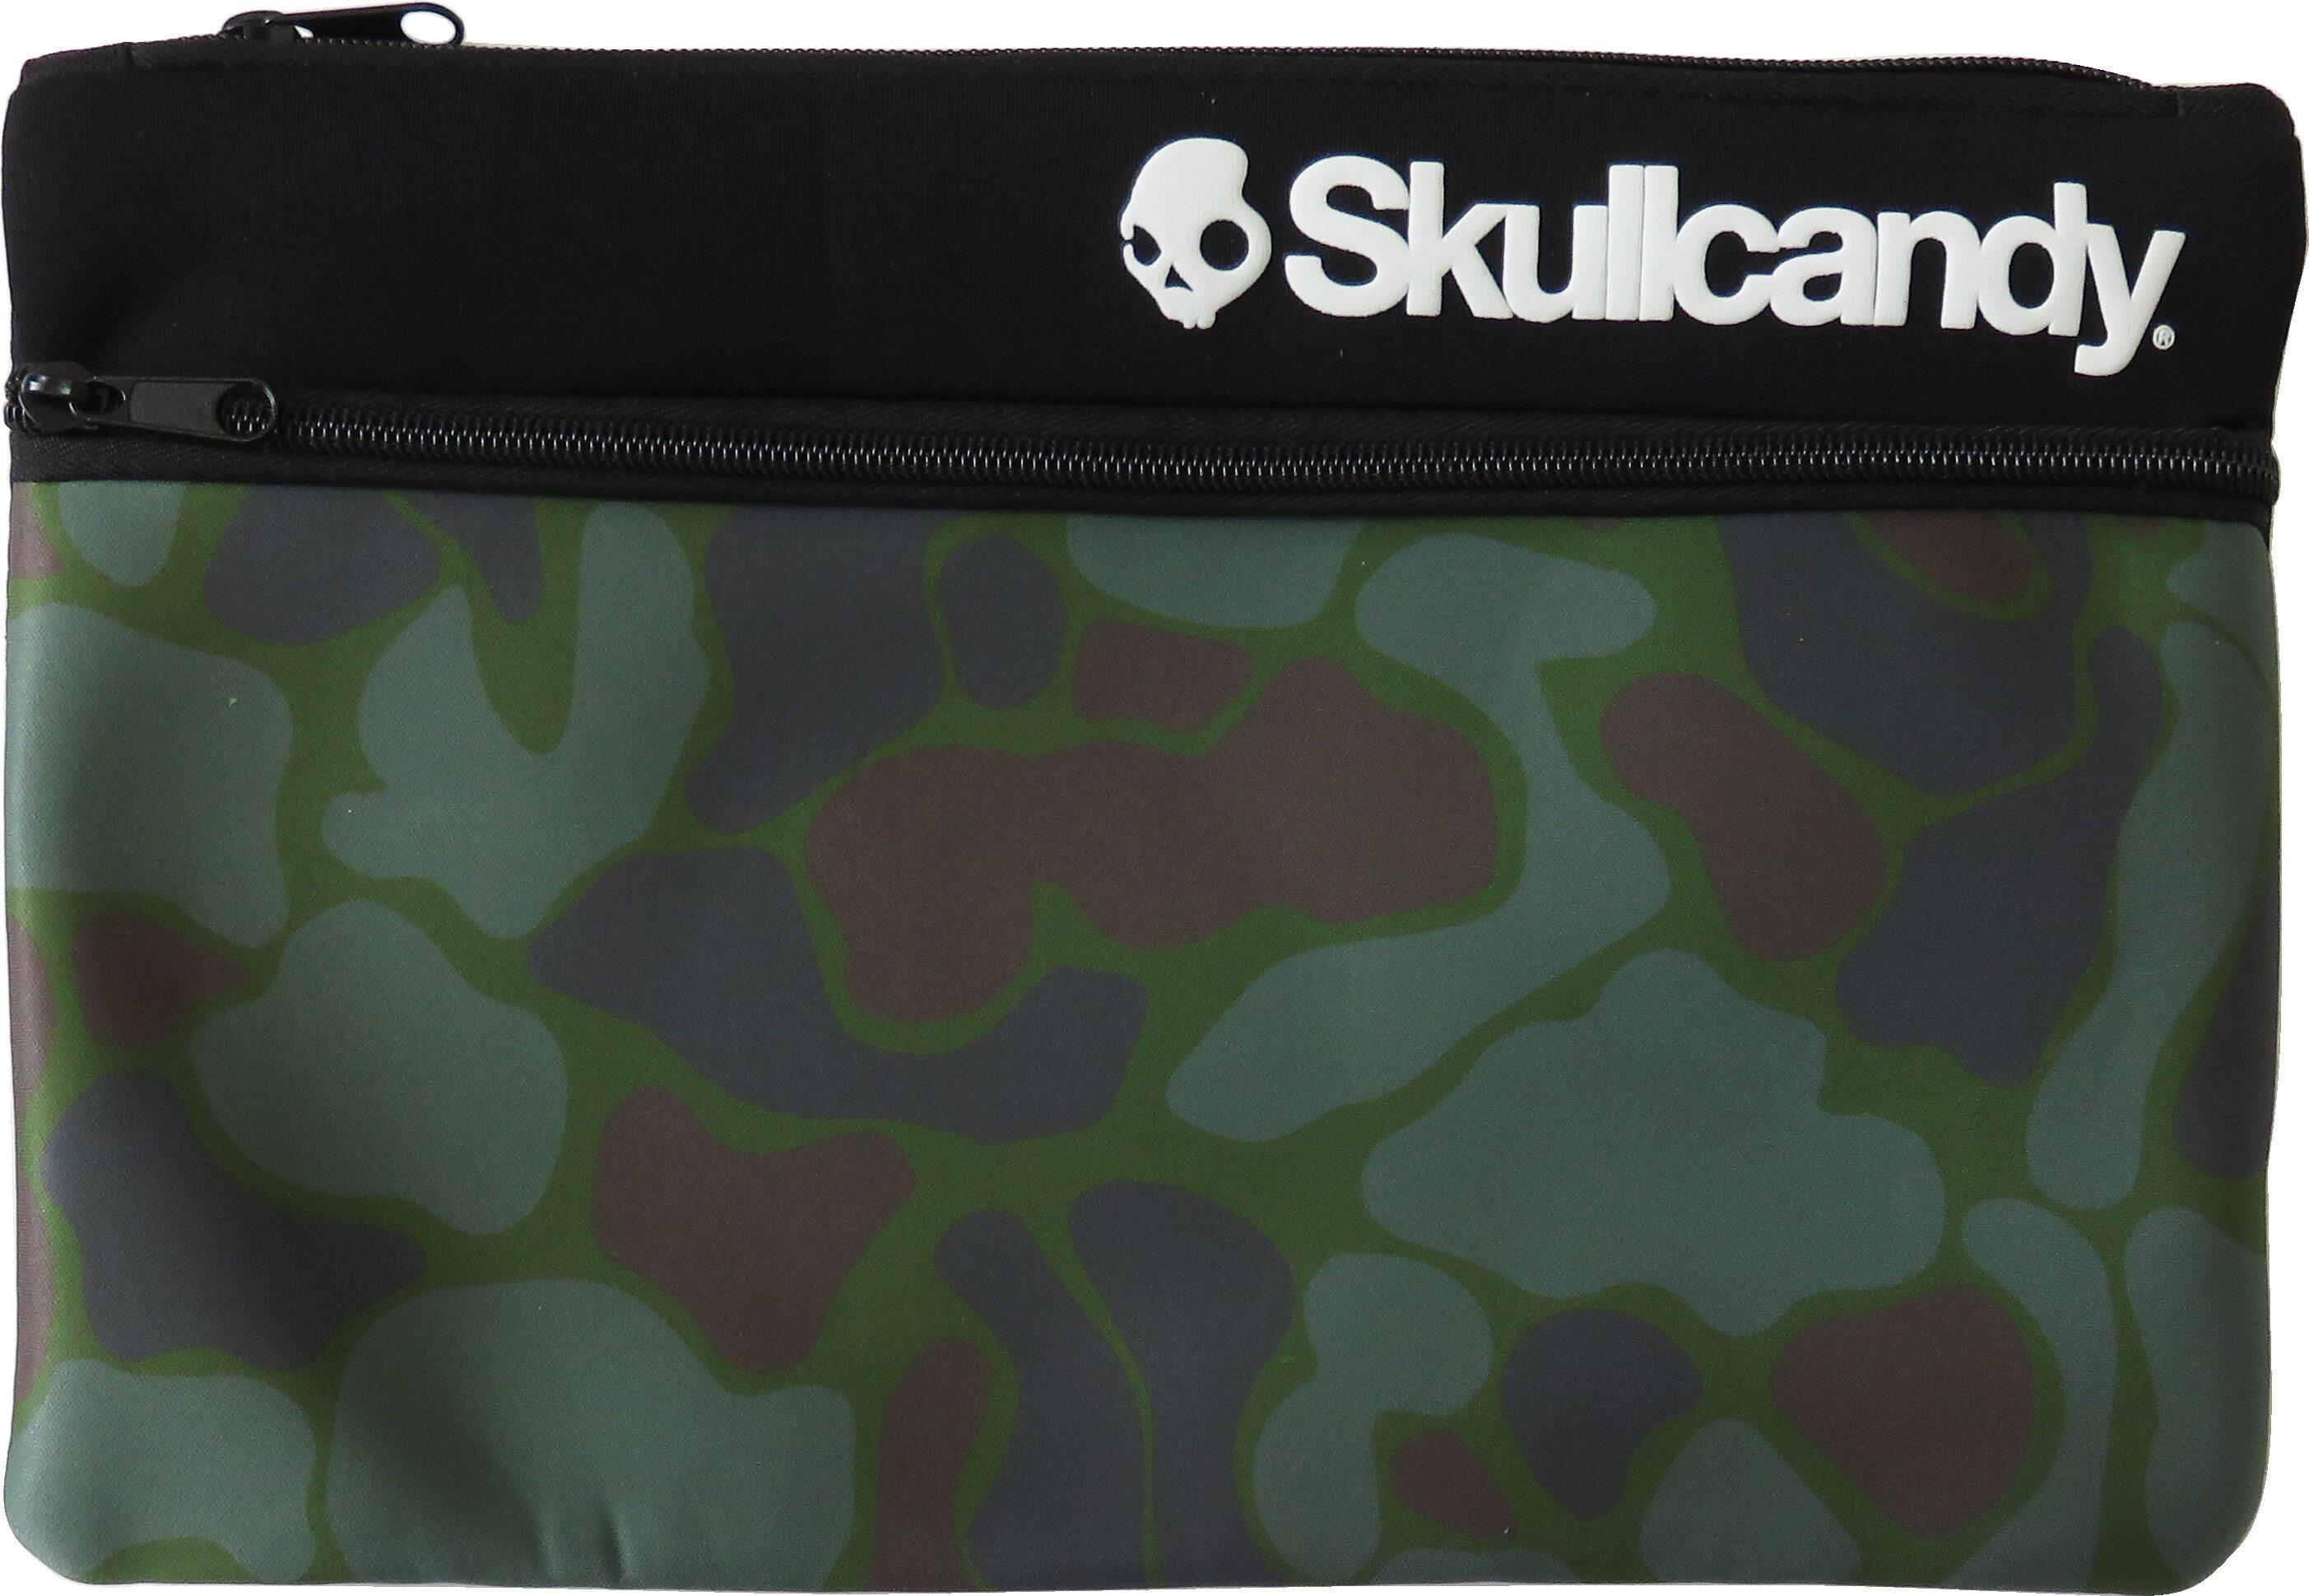 Skullcandy Boys - Double Zip Neoprene Ipad Case